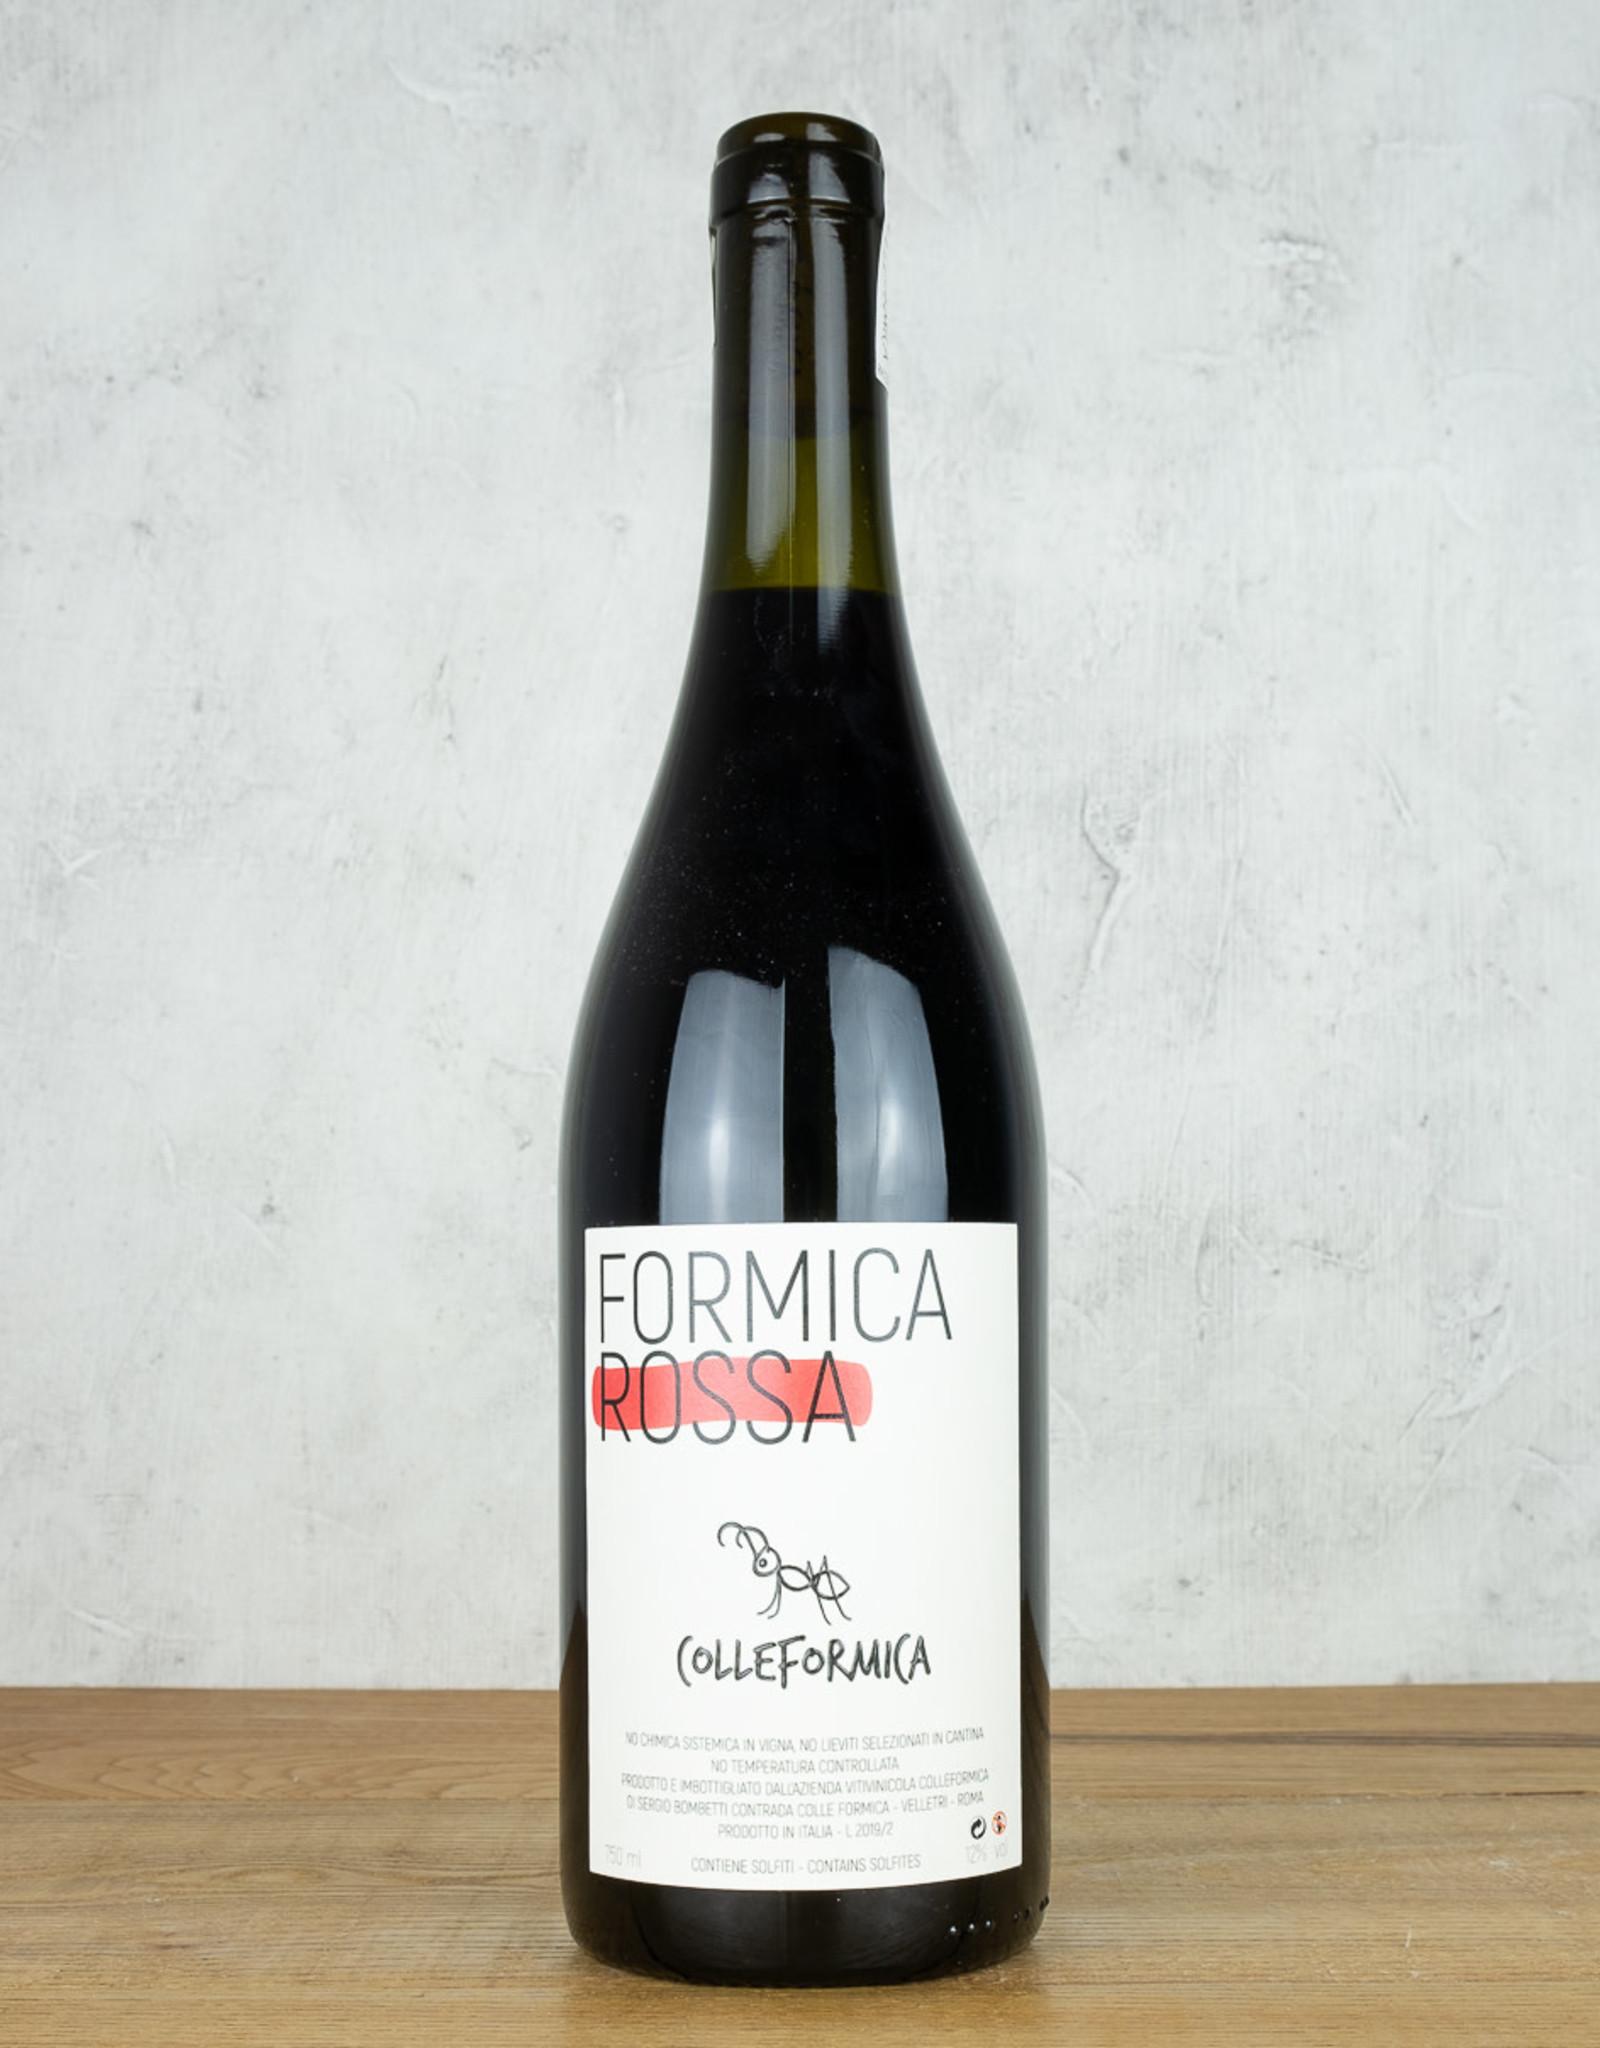 Colleformica Formica Rossa